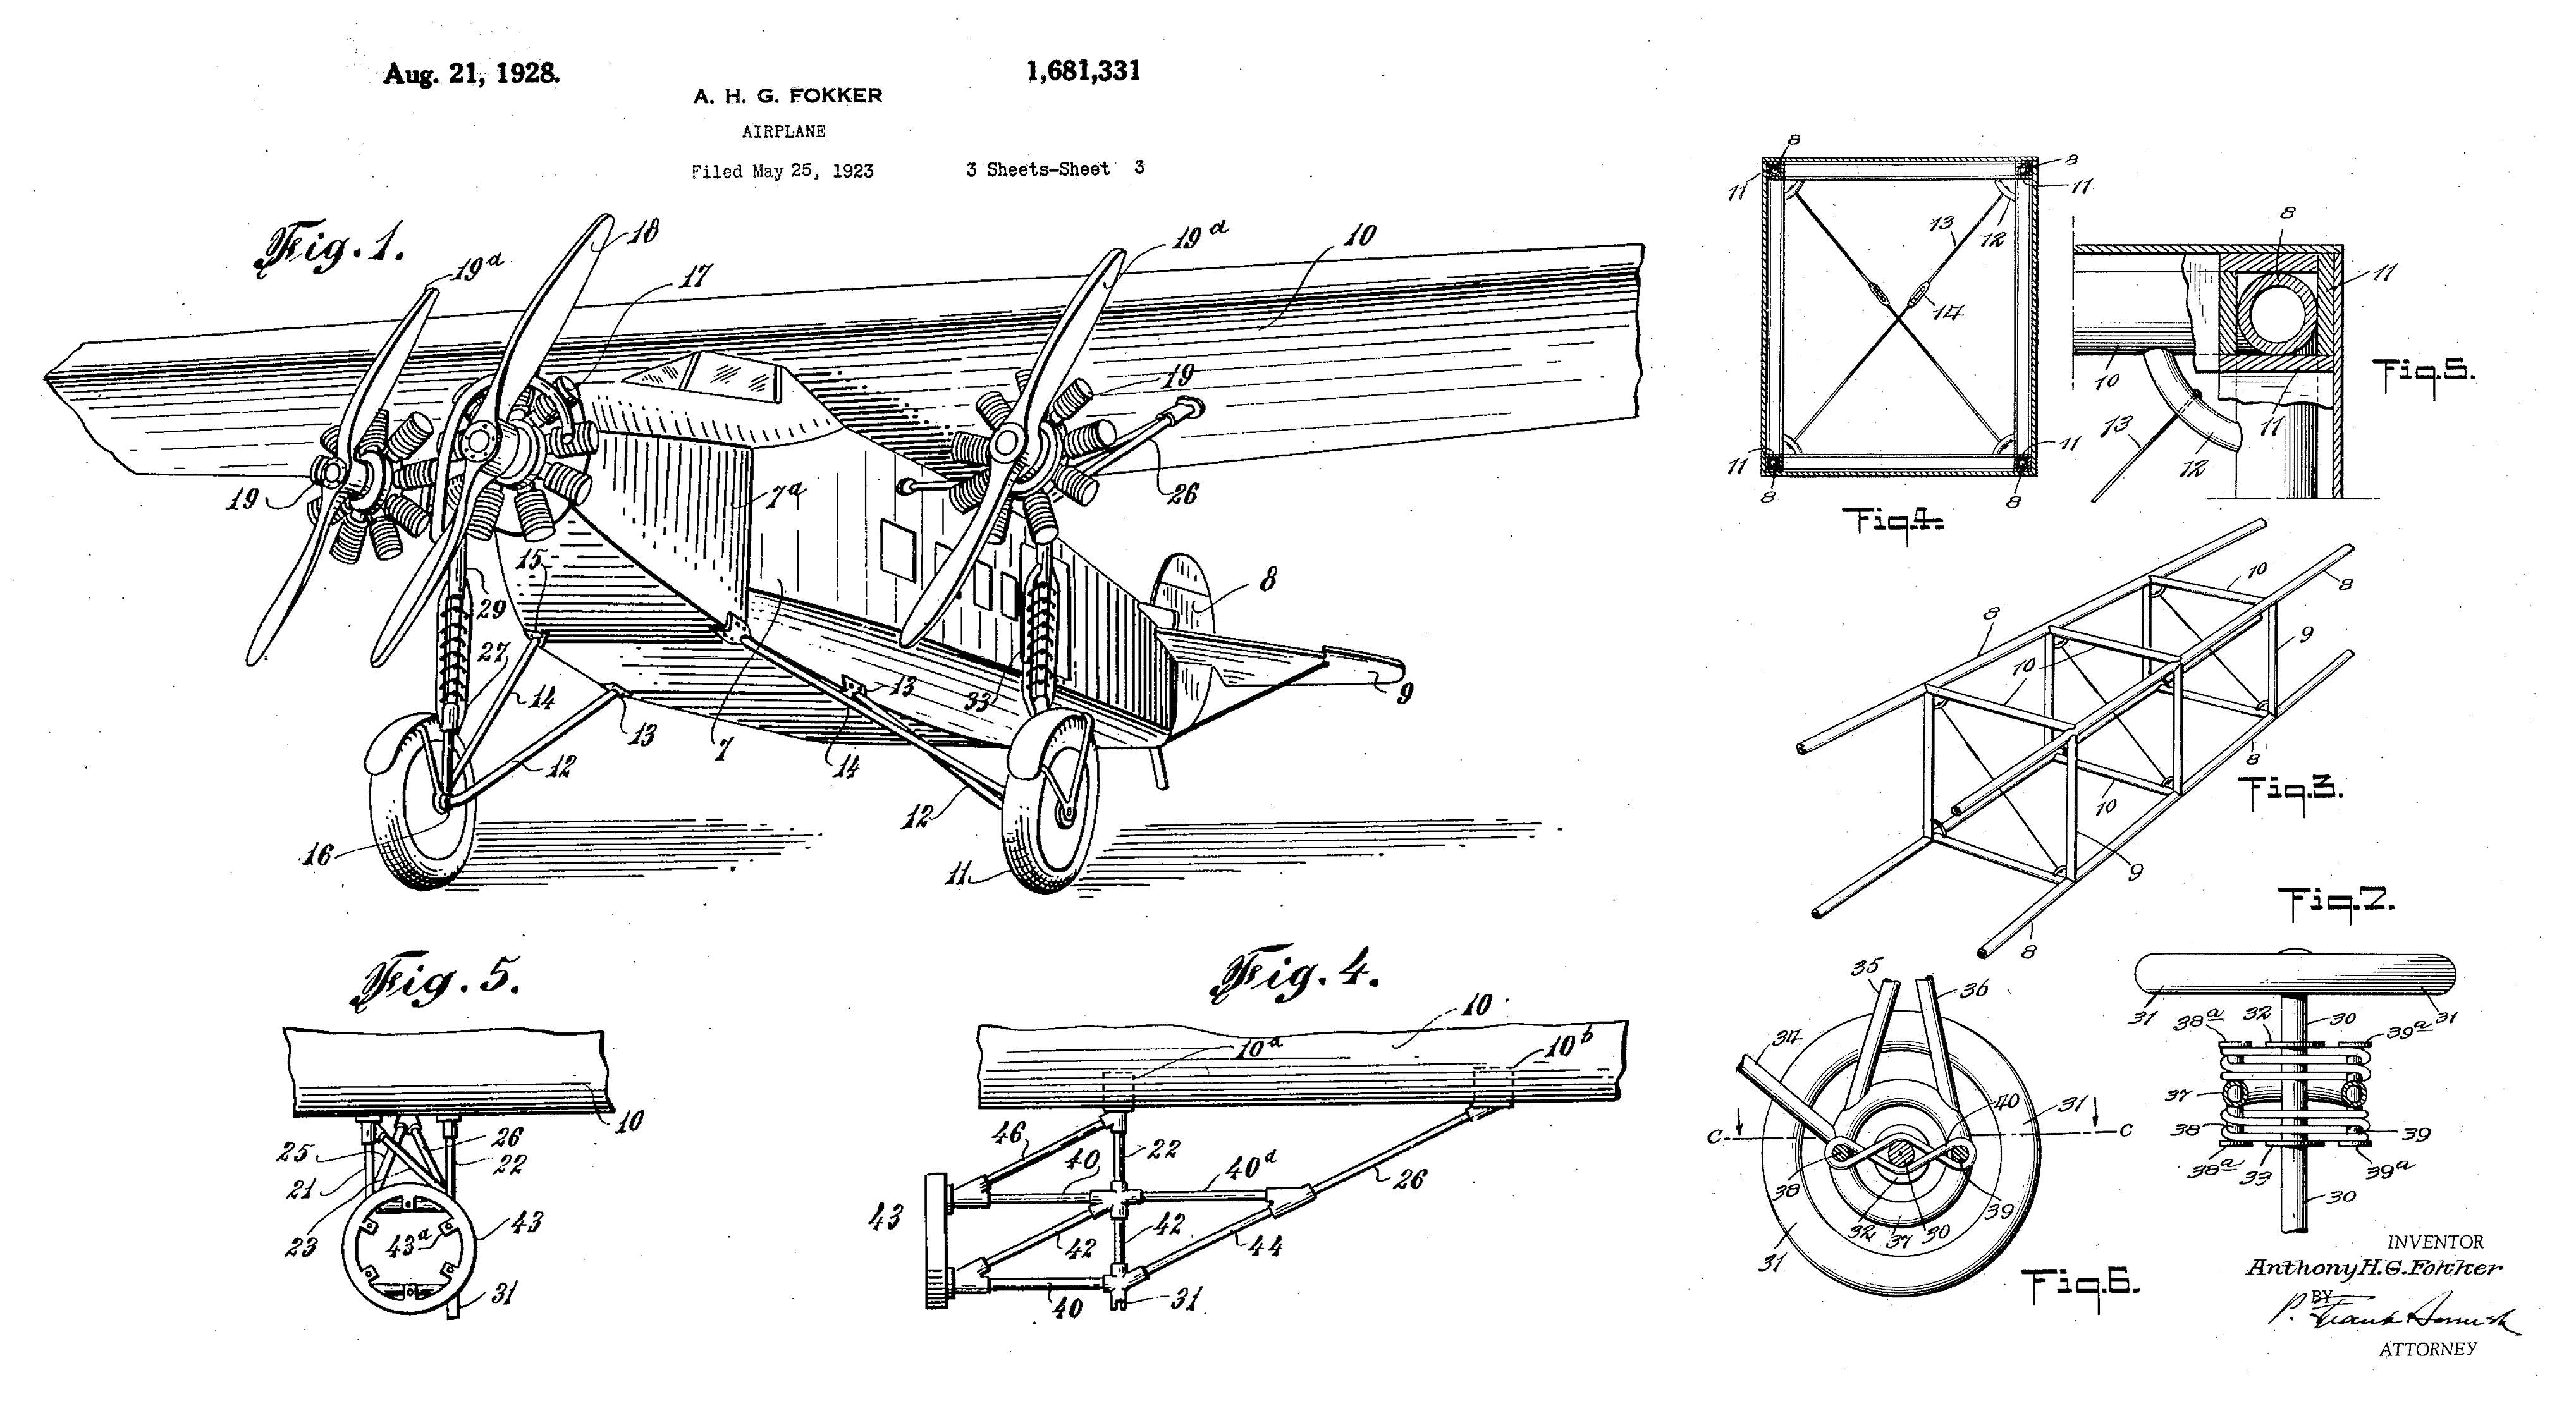 a century of innovations in aerospace welding culminates